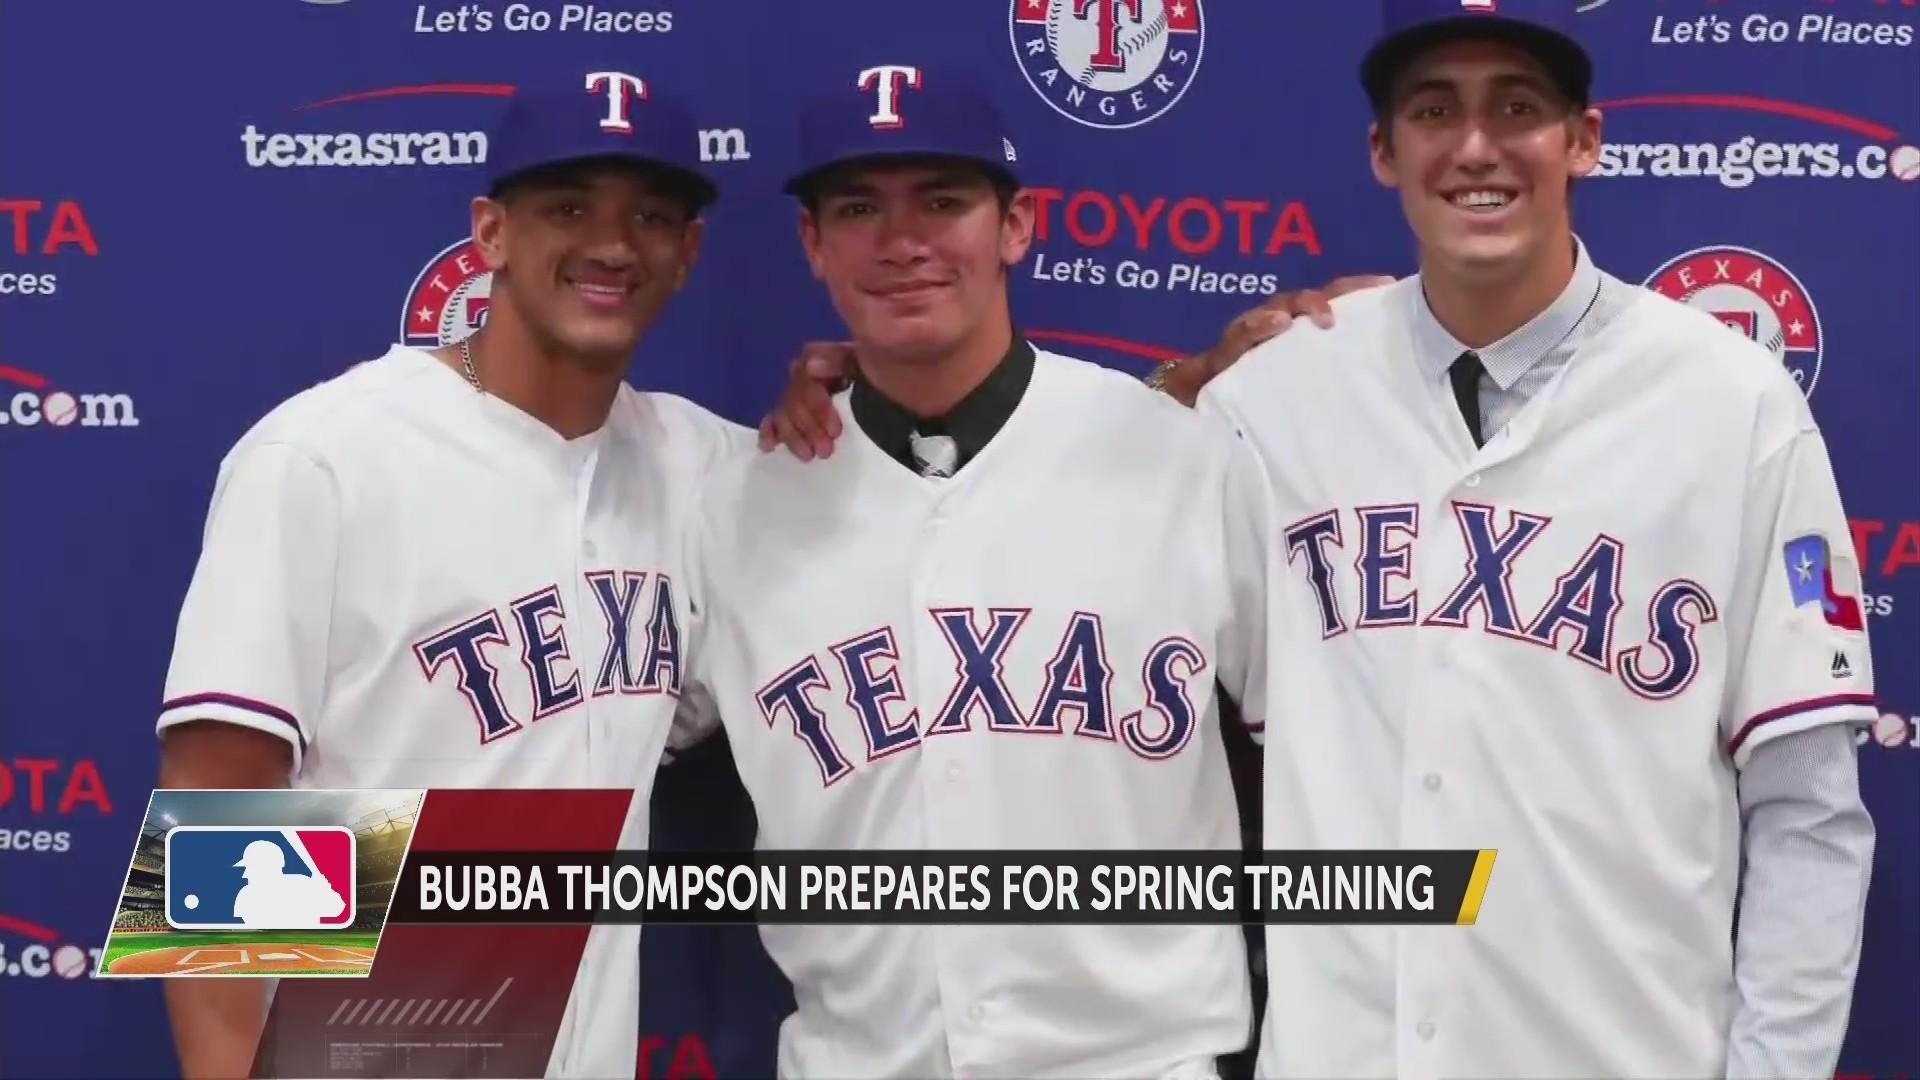 Bubba Thompson Prepares for Spring Training